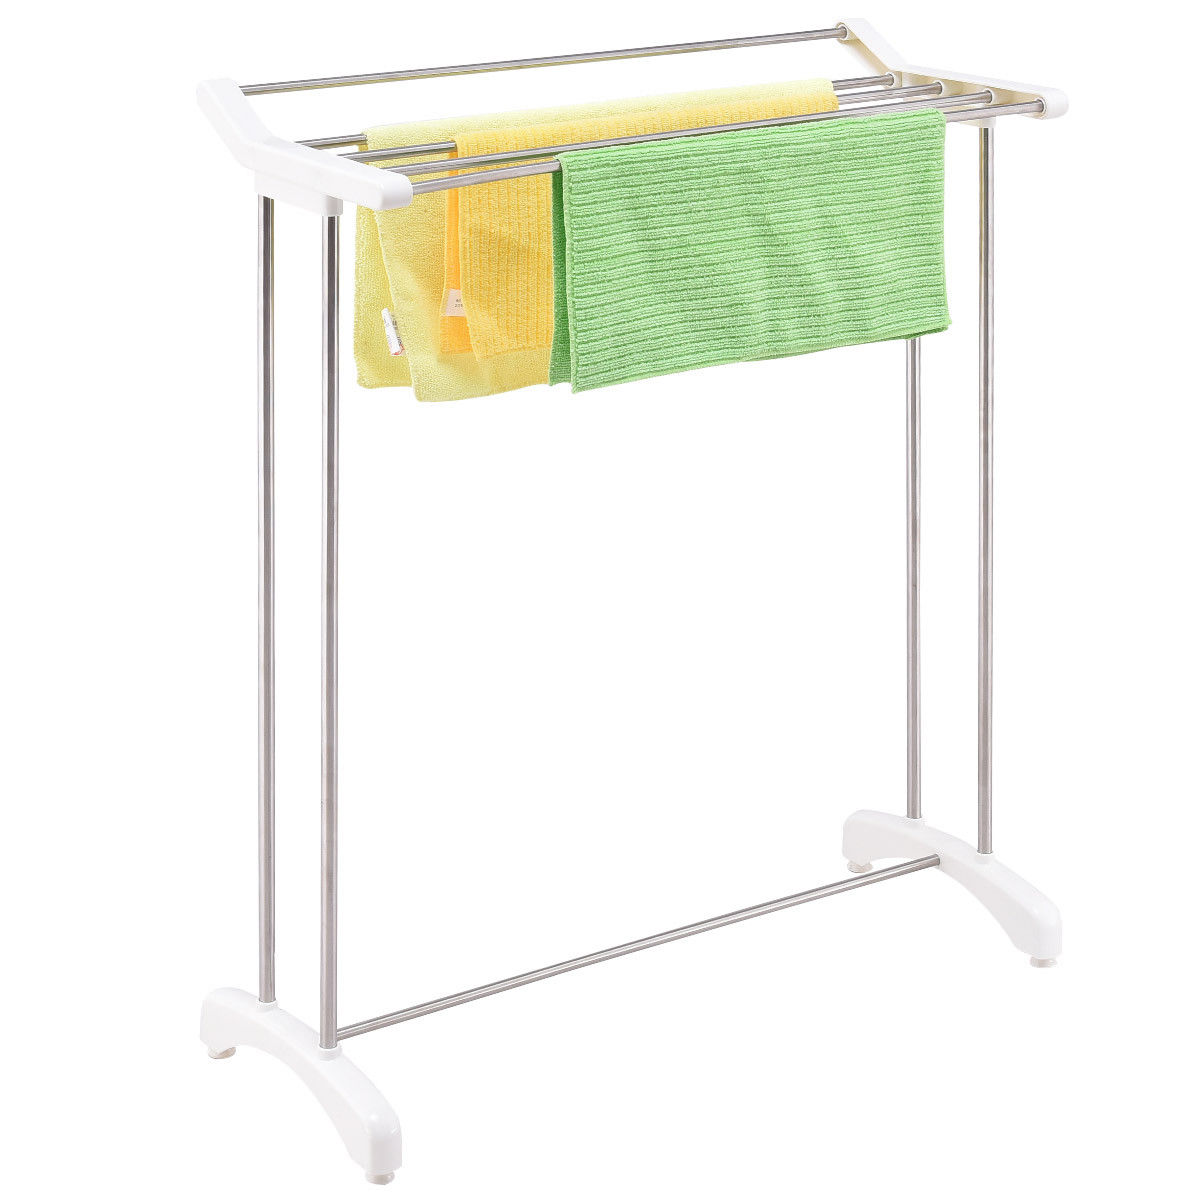 Fullsize Of Towel Rack Stand